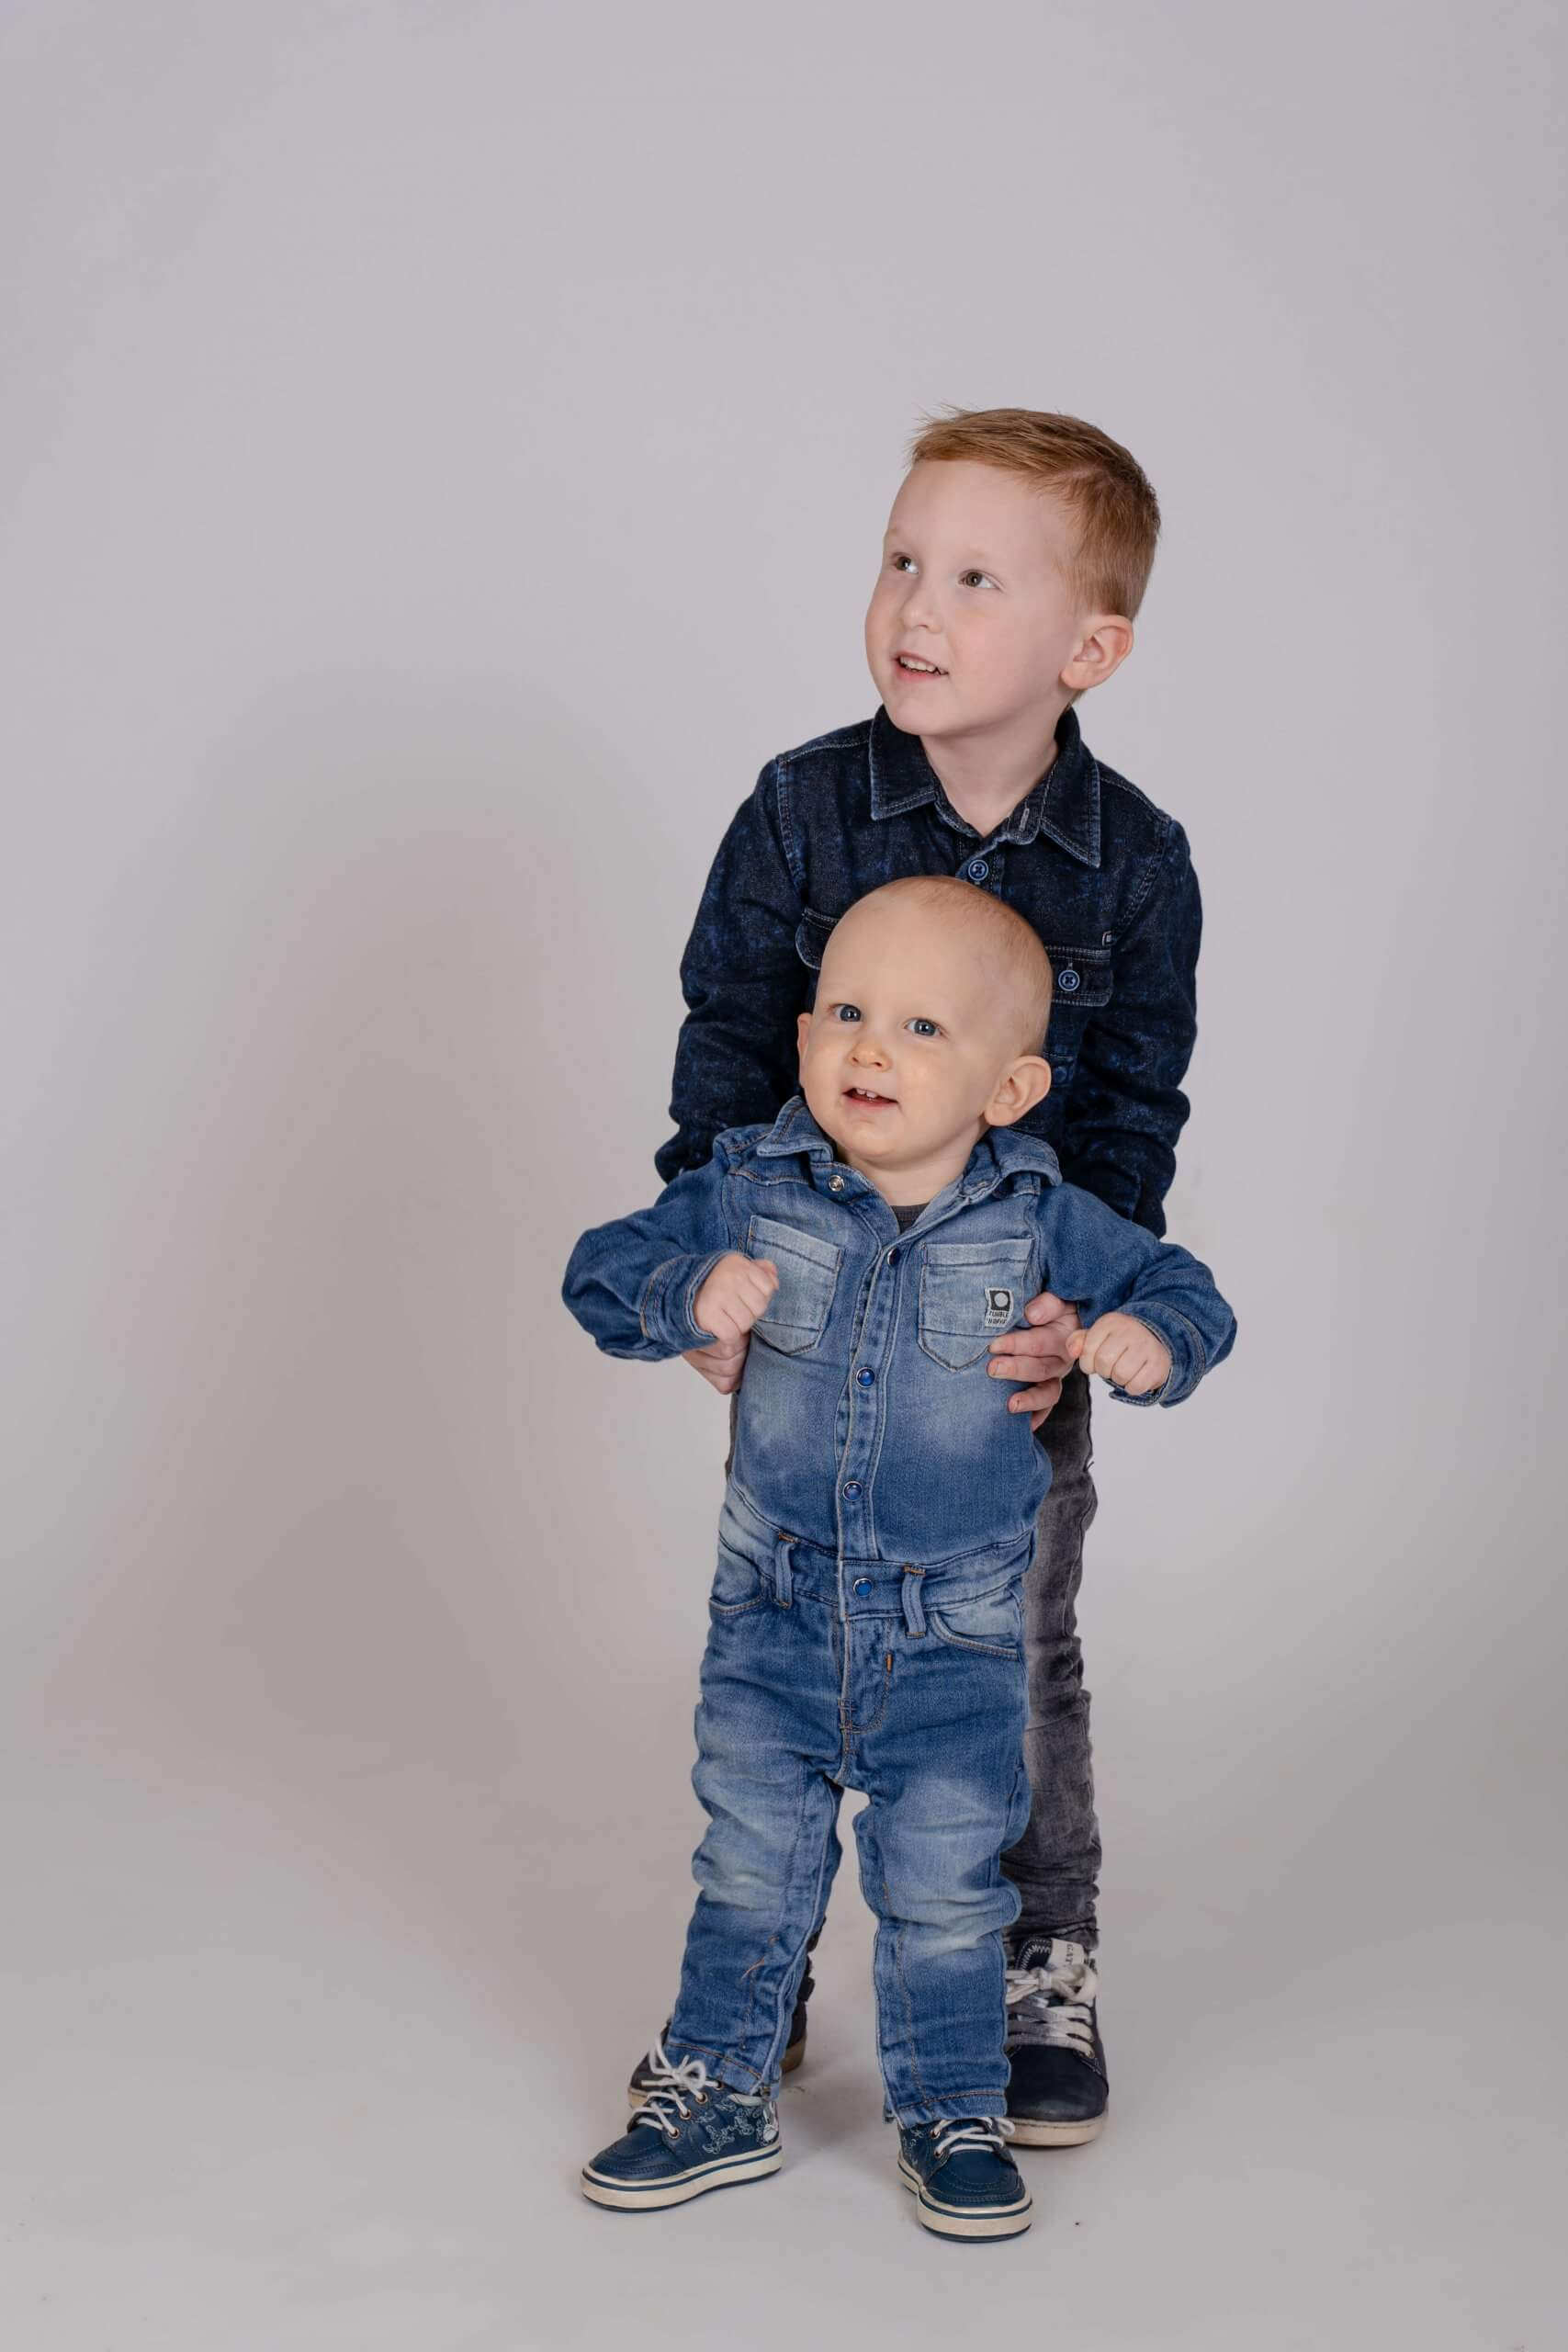 Familie broers fotoshoot samen family utrecht zeist driebergen